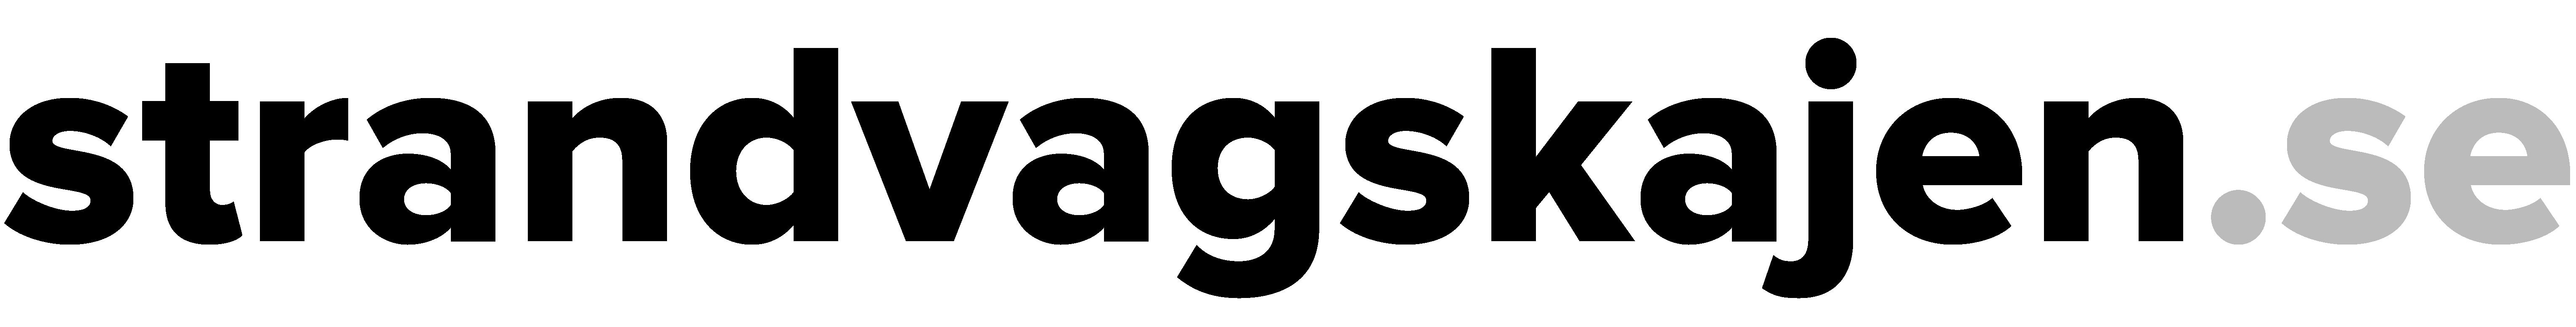 Logo Strandvägskajen - @strandvagskajen - strandvagkajen.se